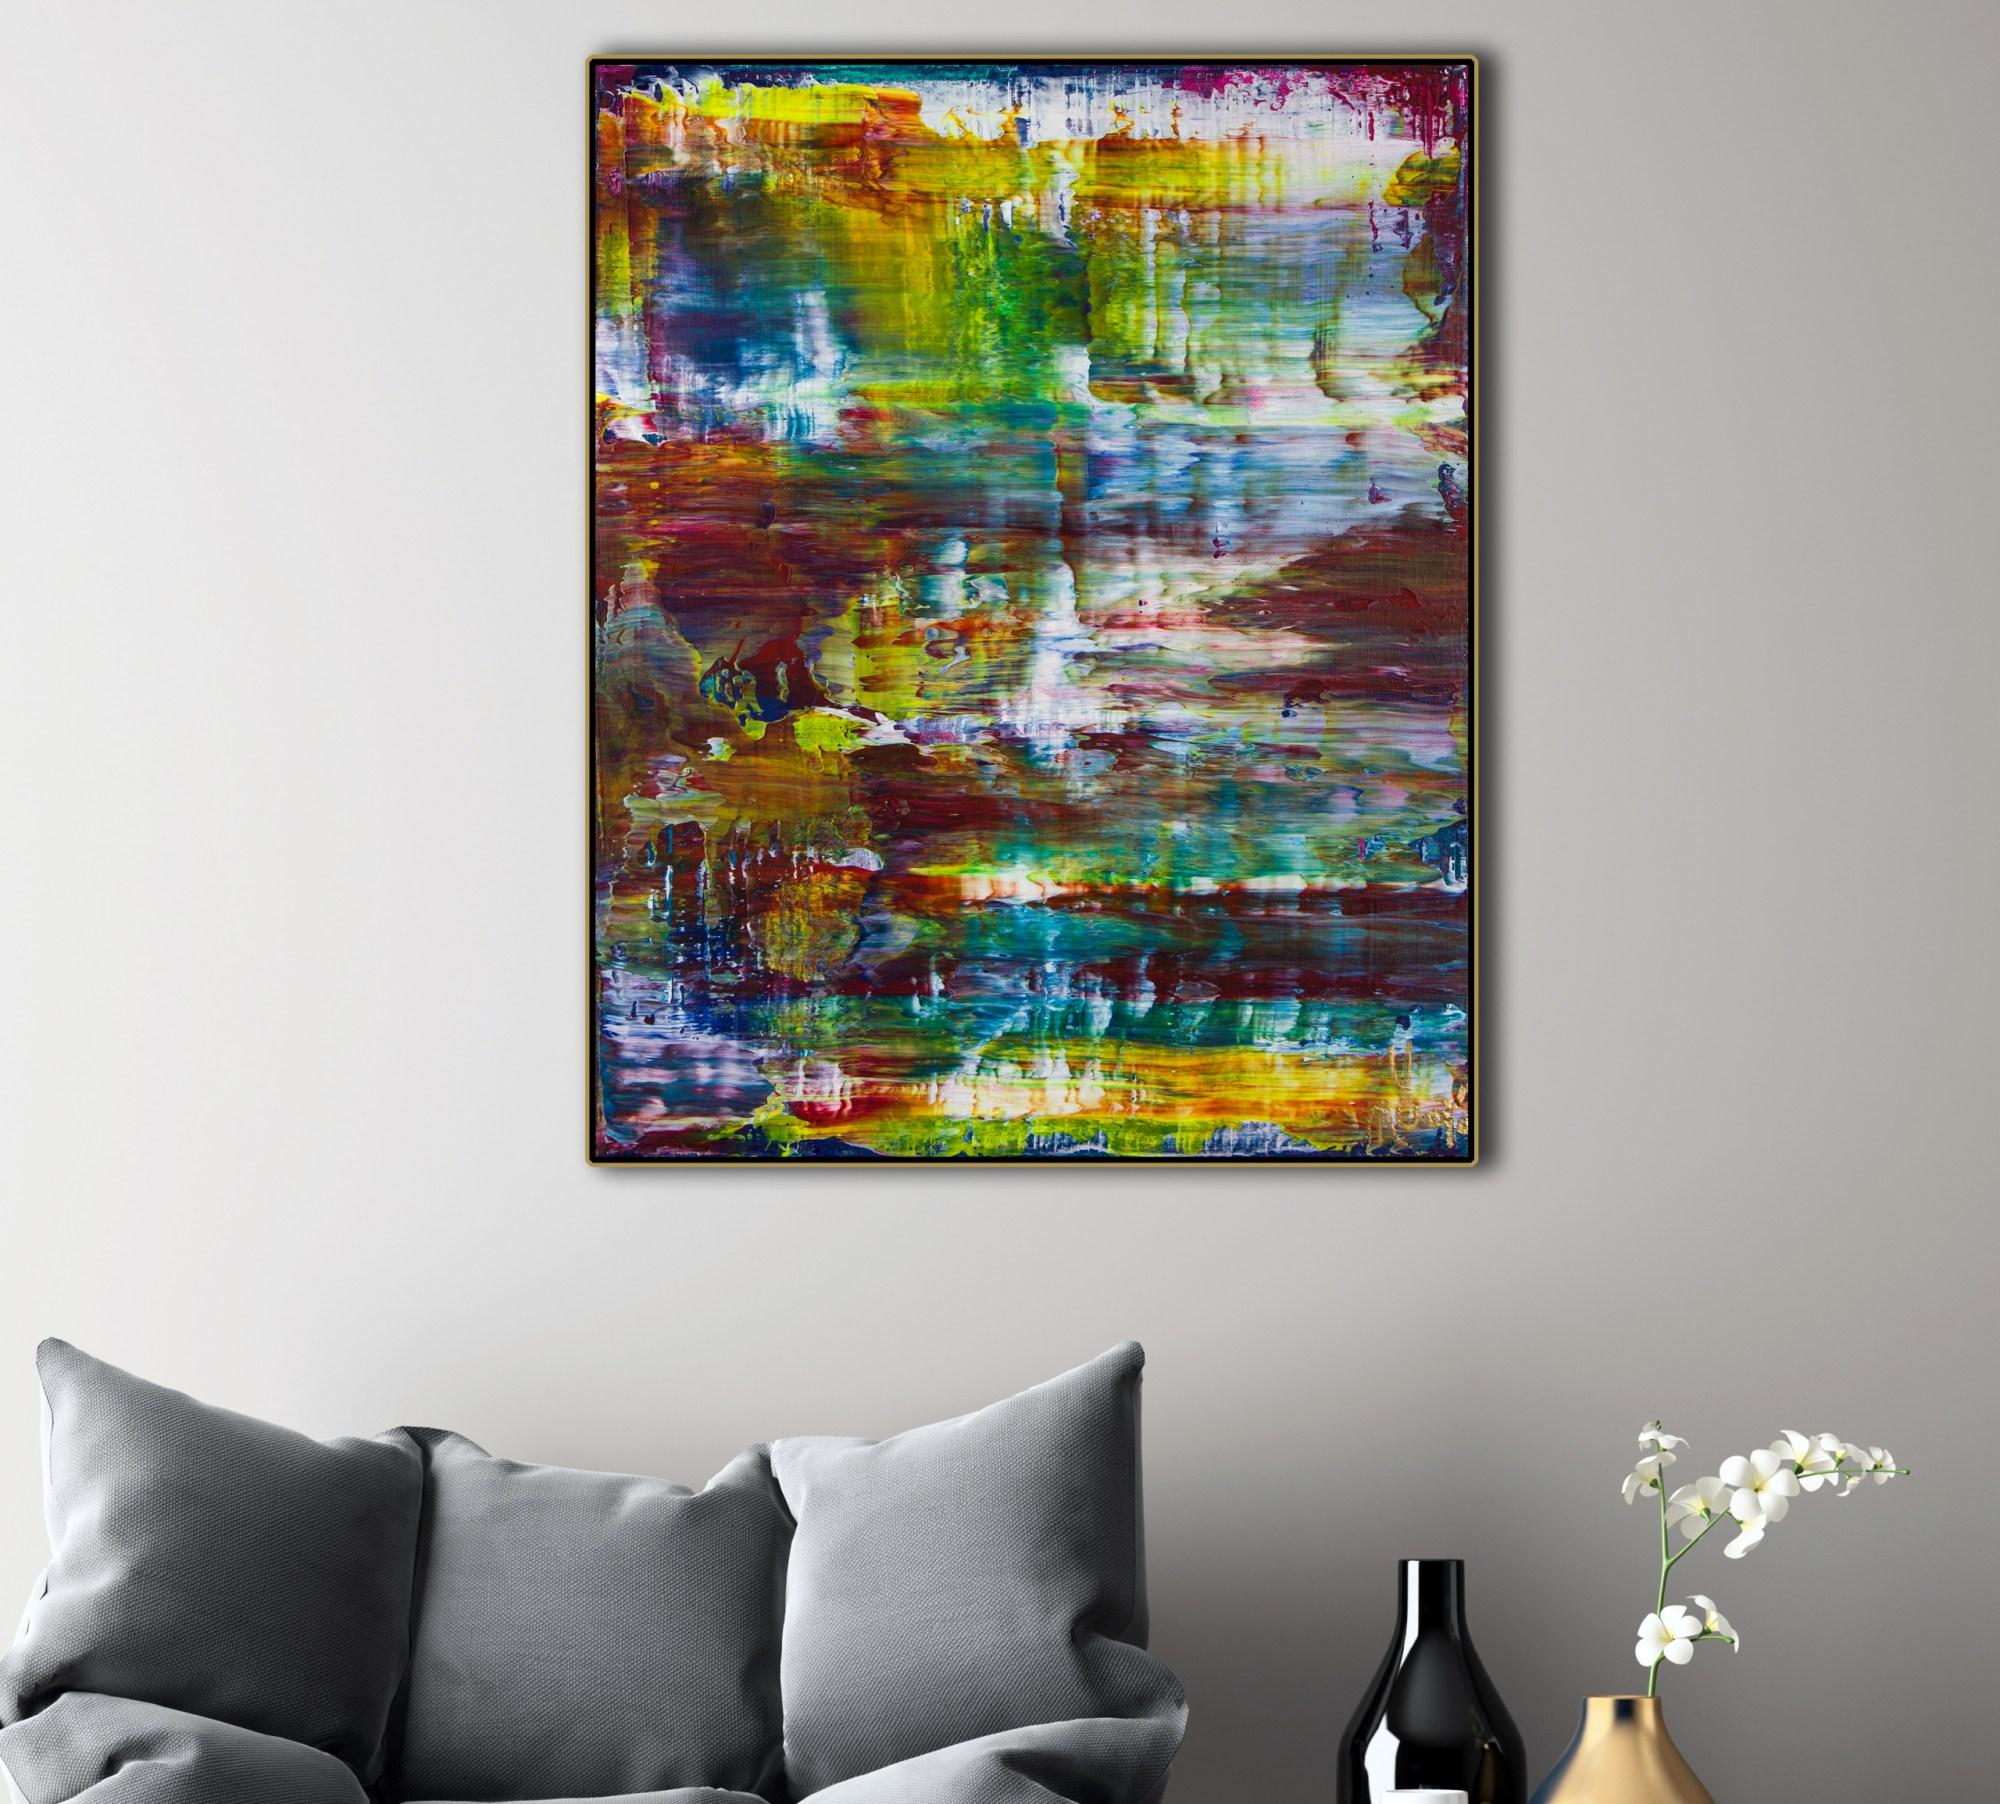 SOLD - Nocturn Panorama 6 (2021) / Room example / Artist: Nestor Toro